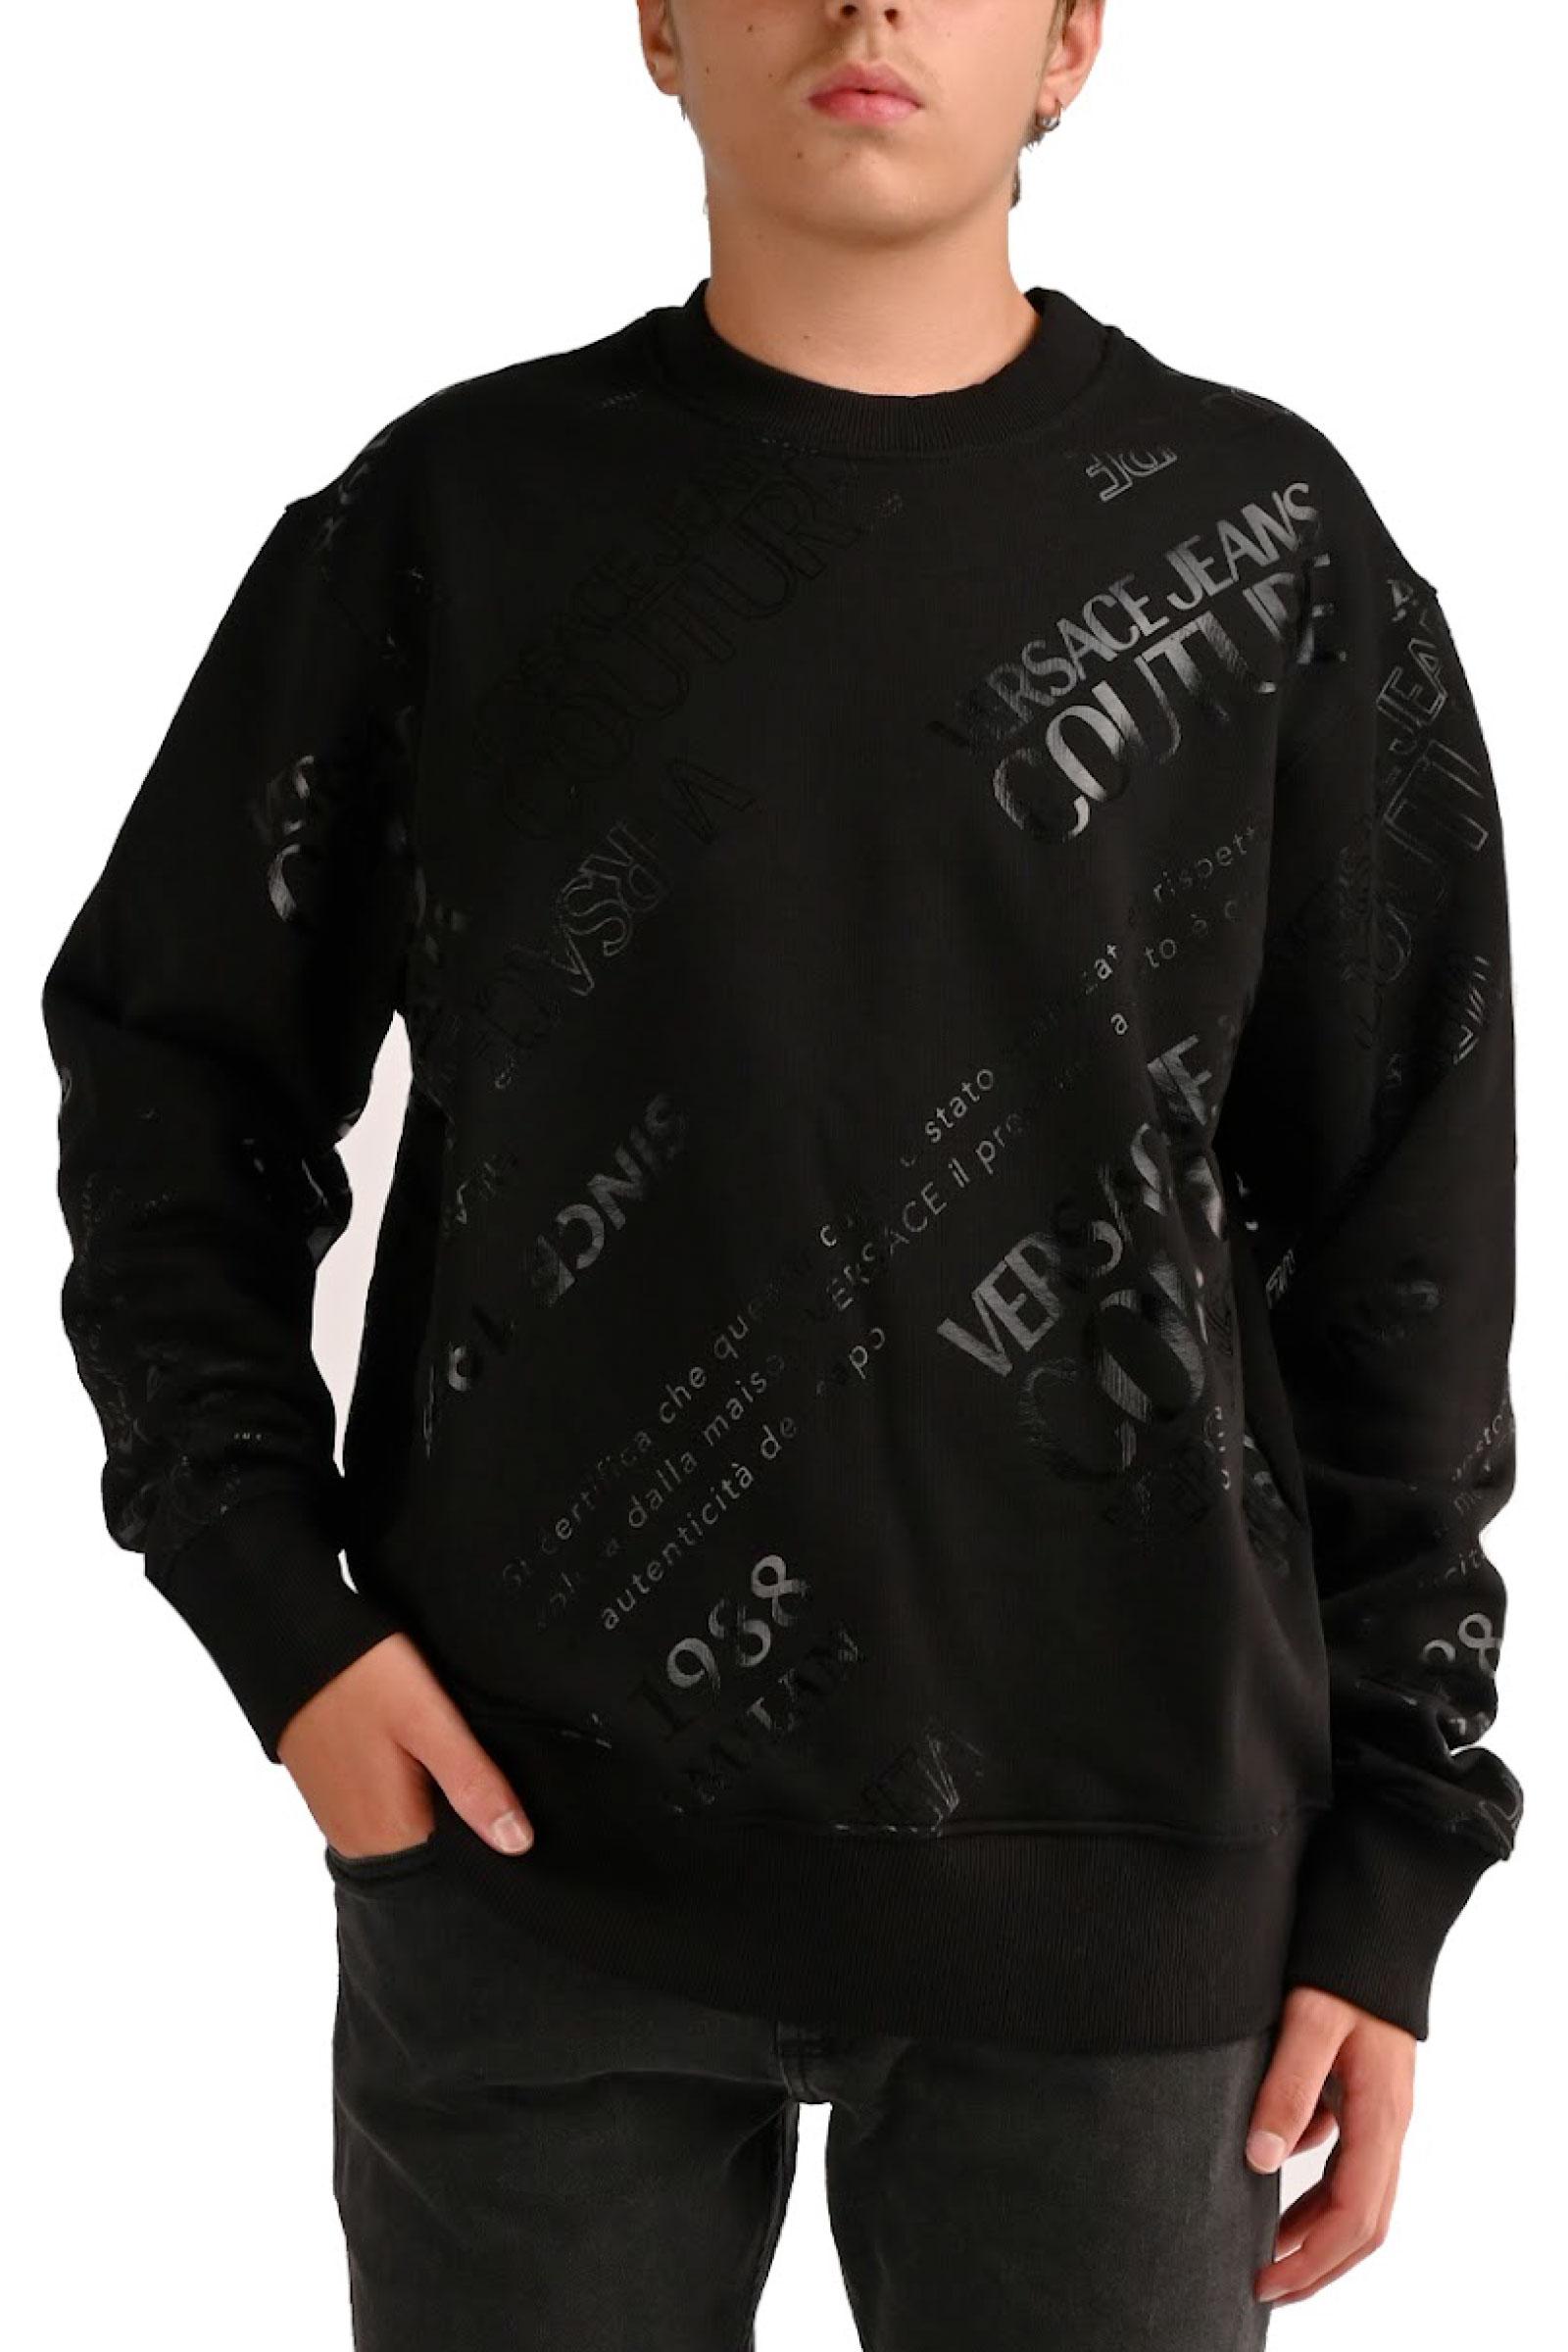 VERSACE JEANS COUTURE | Sweatshirt | 71GAIT14 CF00T802